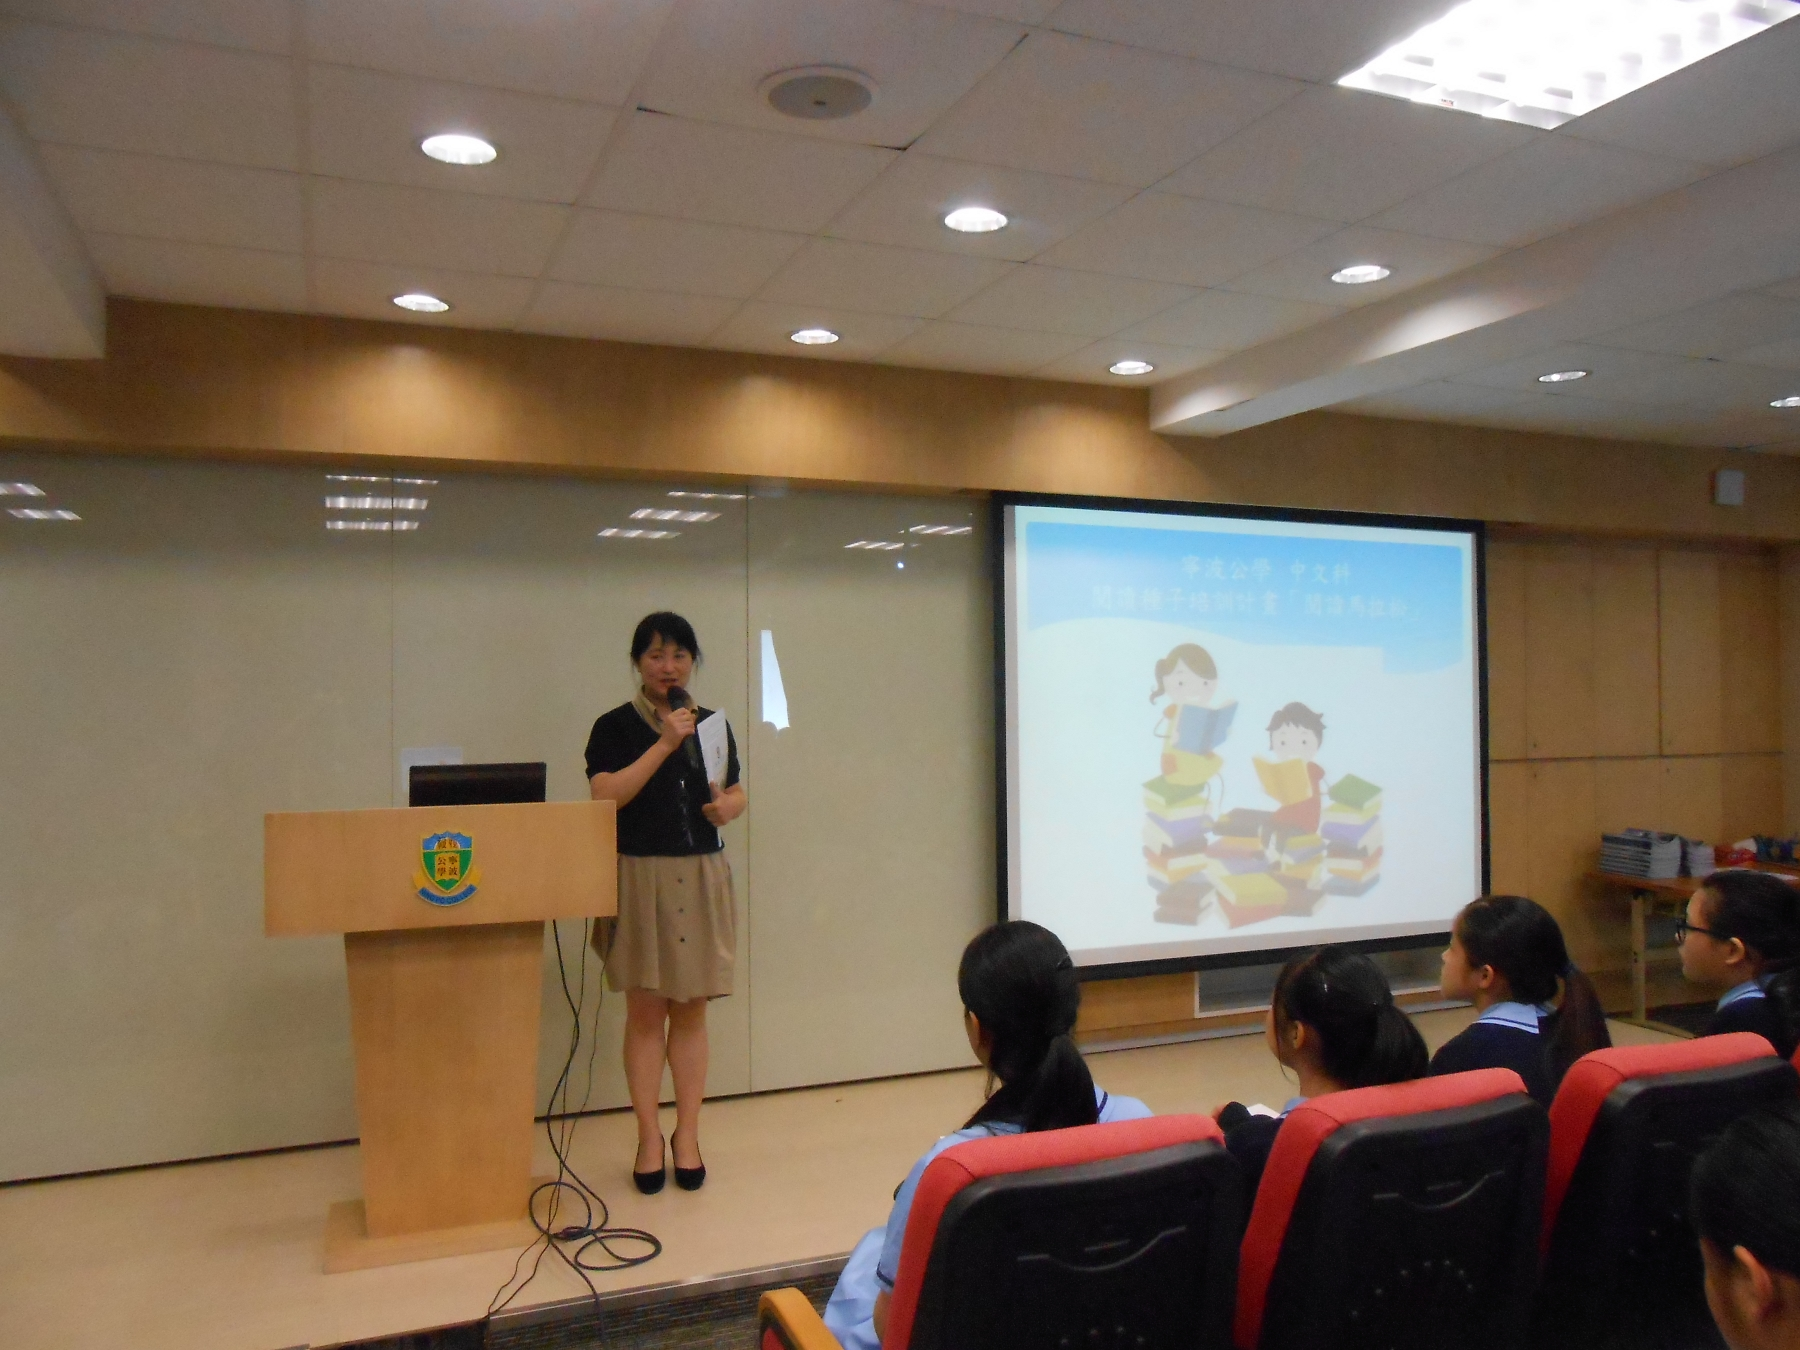 http://www.npc.edu.hk/sites/default/files/dscn1337.jpg